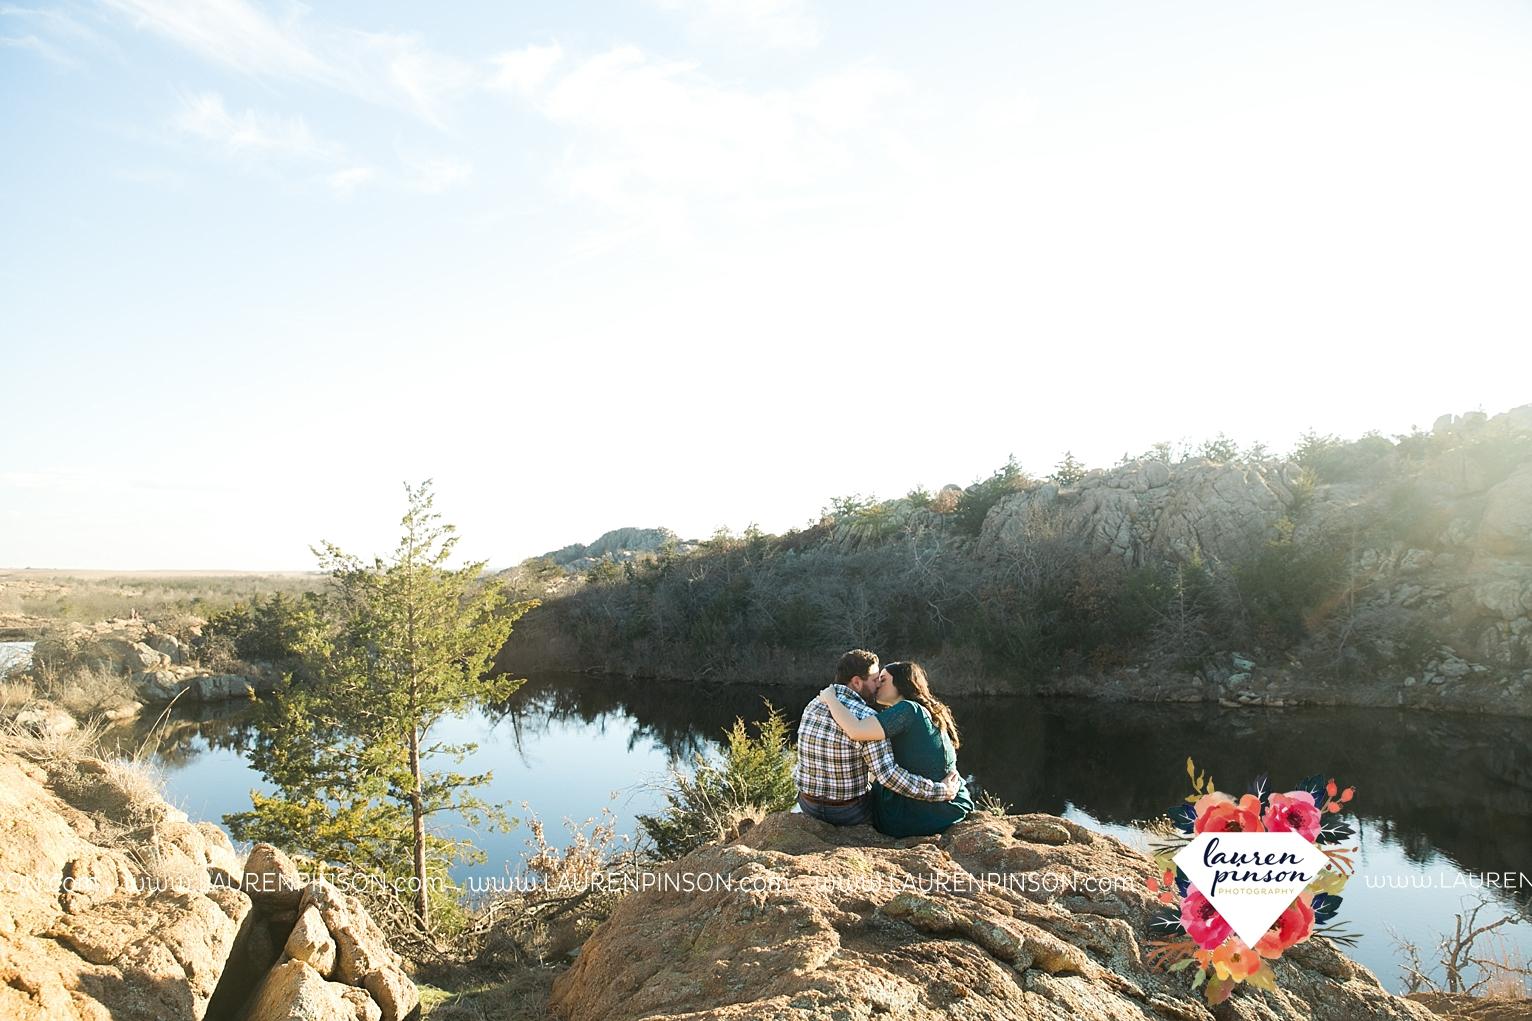 wichita-falls-texas-engagement-photographer-wedding-oklahoma-lawton-wichita-mountains-refuge-outdoors-mountains-engaged_2051.jpg